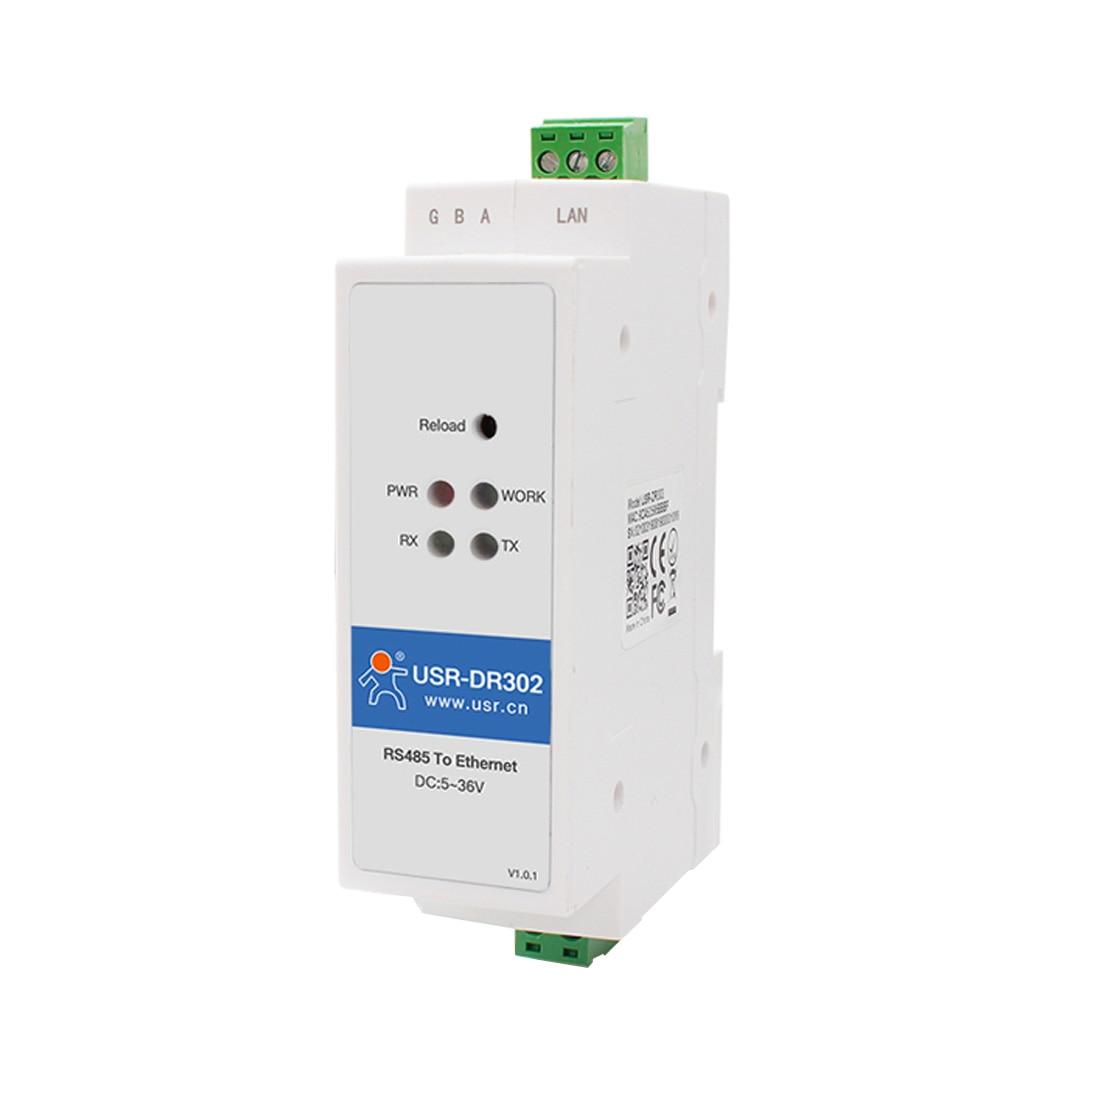 USR-DR302 DIN-Rail Modbus RS485 SERIAL Port TO Ethernet Converter Bidirectional Transparent Transmission Between RS485 And RJ45